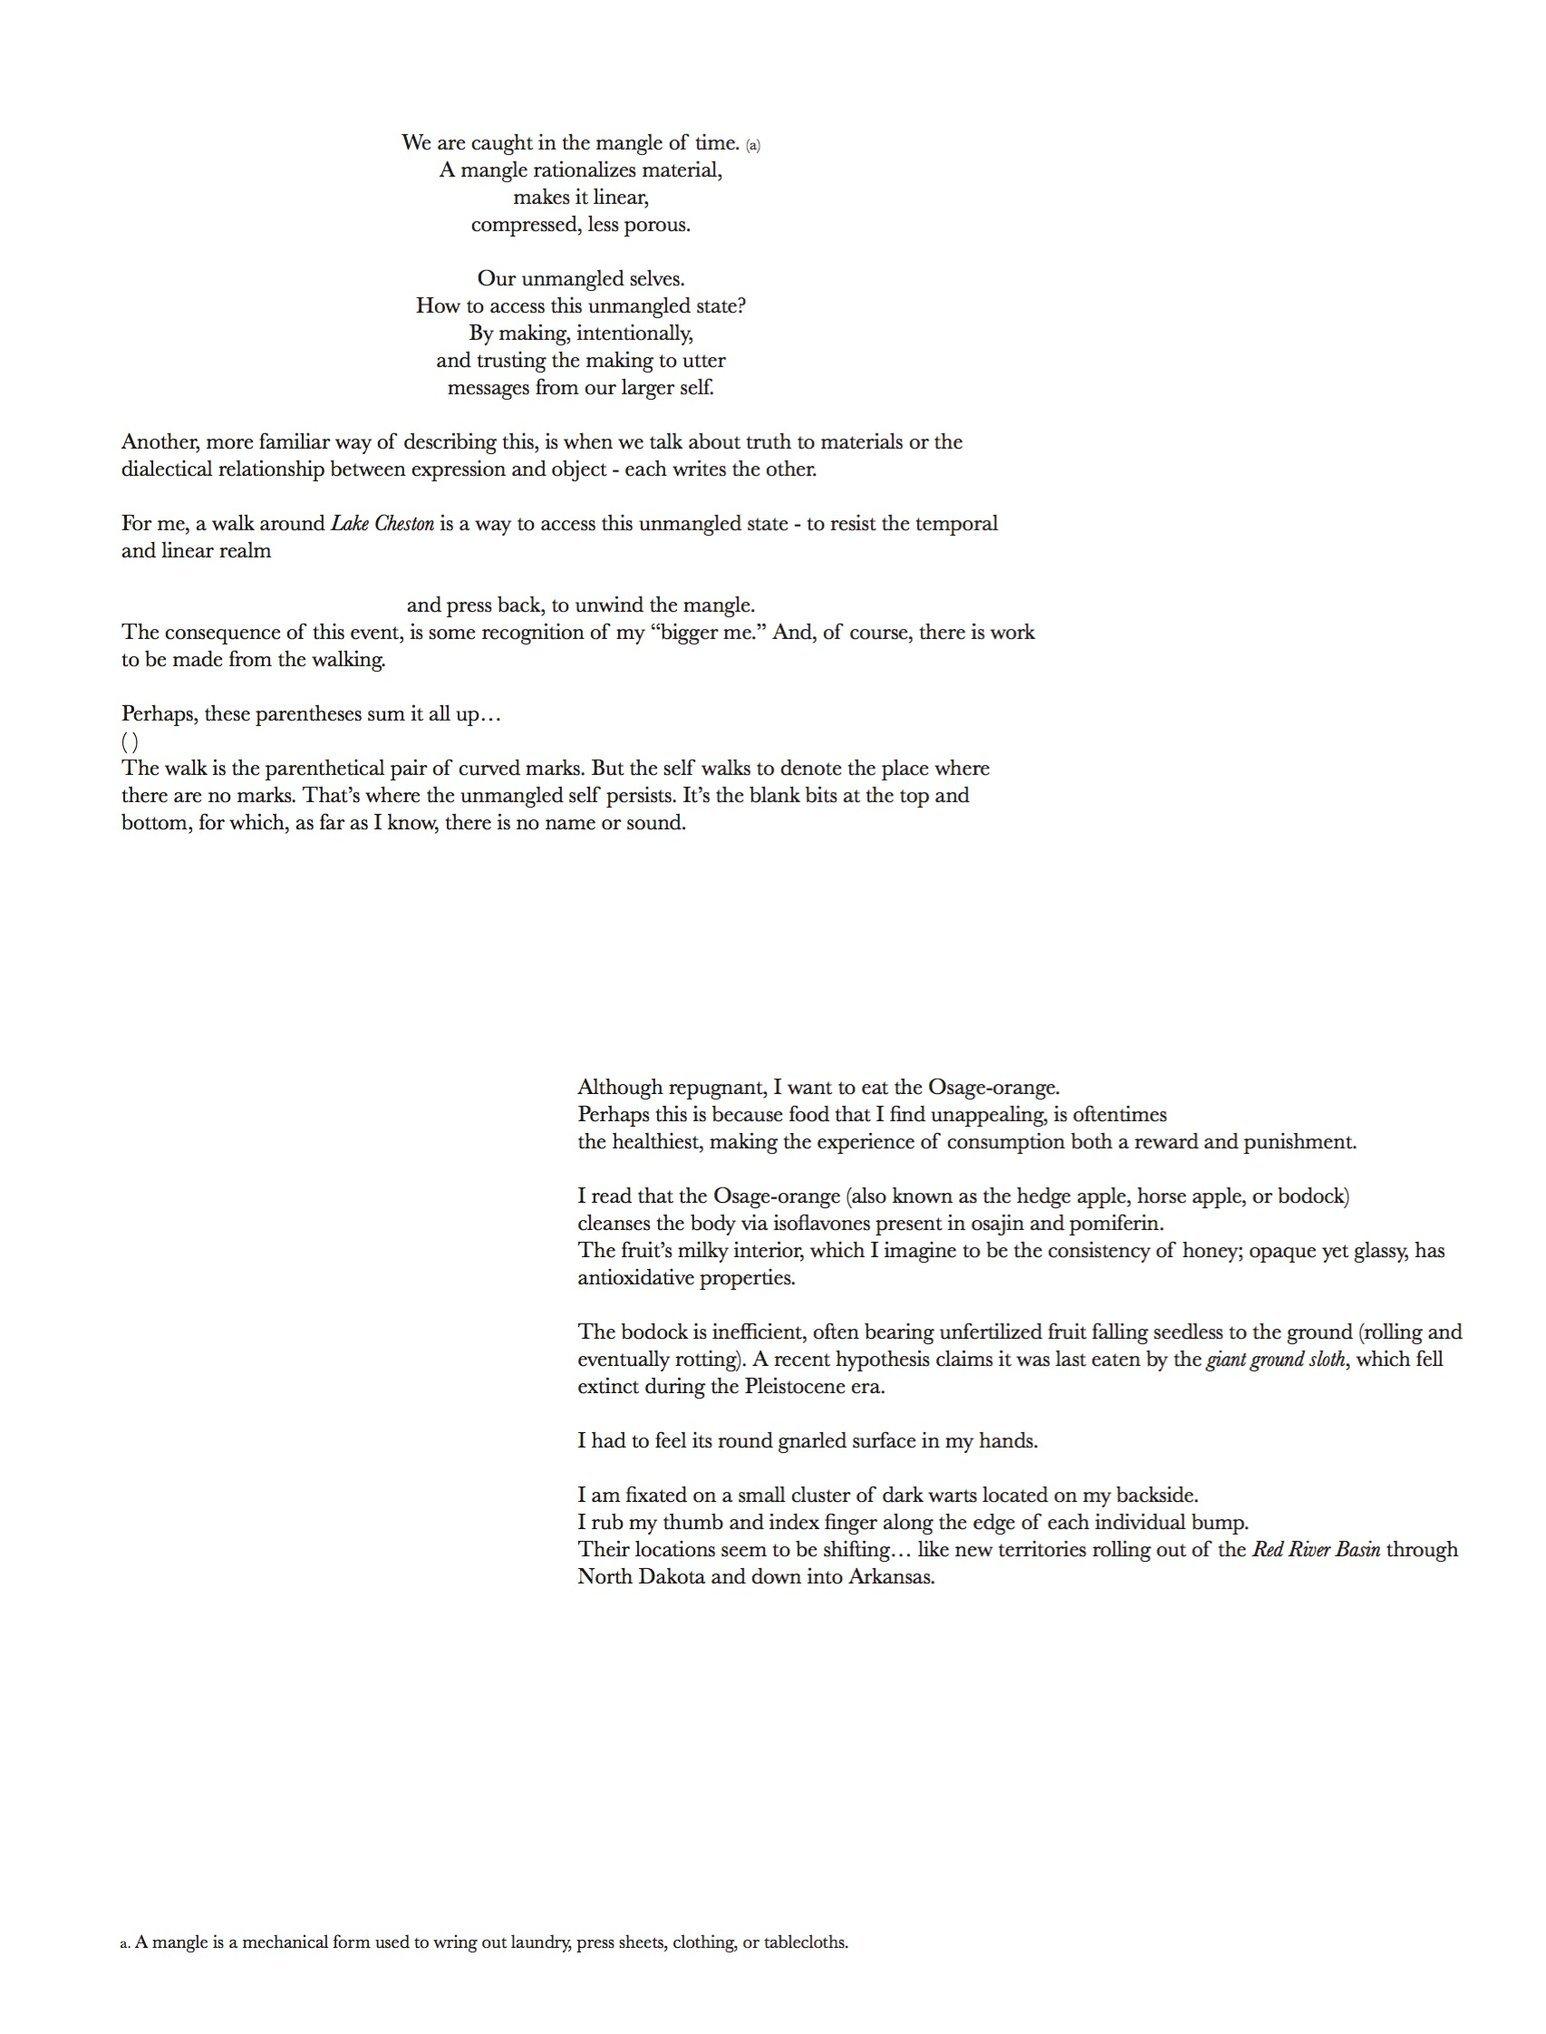 PD_writingproject_NewsClub (dragged) 2.jpg